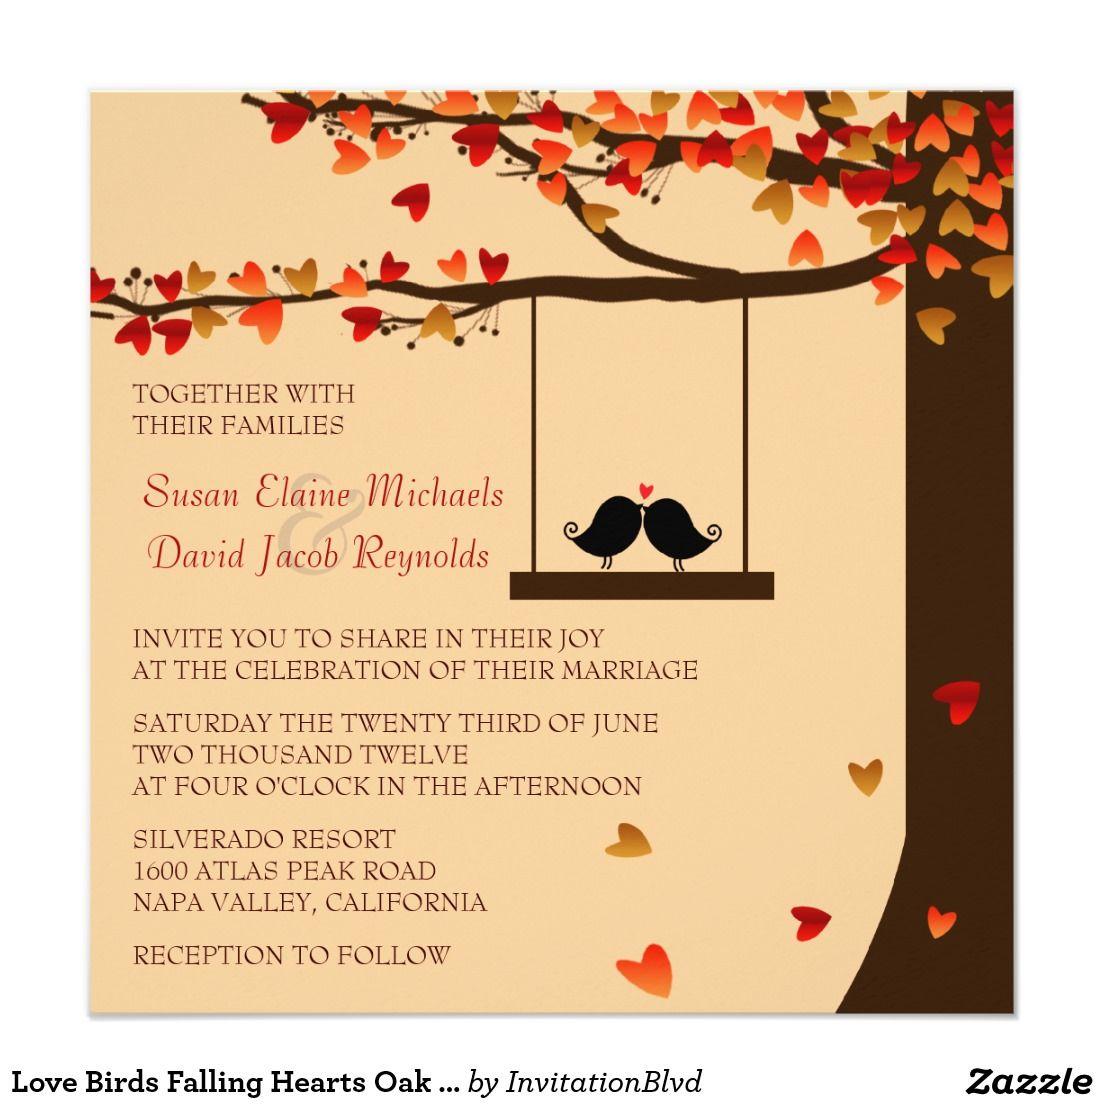 Love Birds Falling Hearts Oak Tree Wedding Invite 525 Square Invitation Card: Bird Themed Wedding Invitations At Reisefeber.org